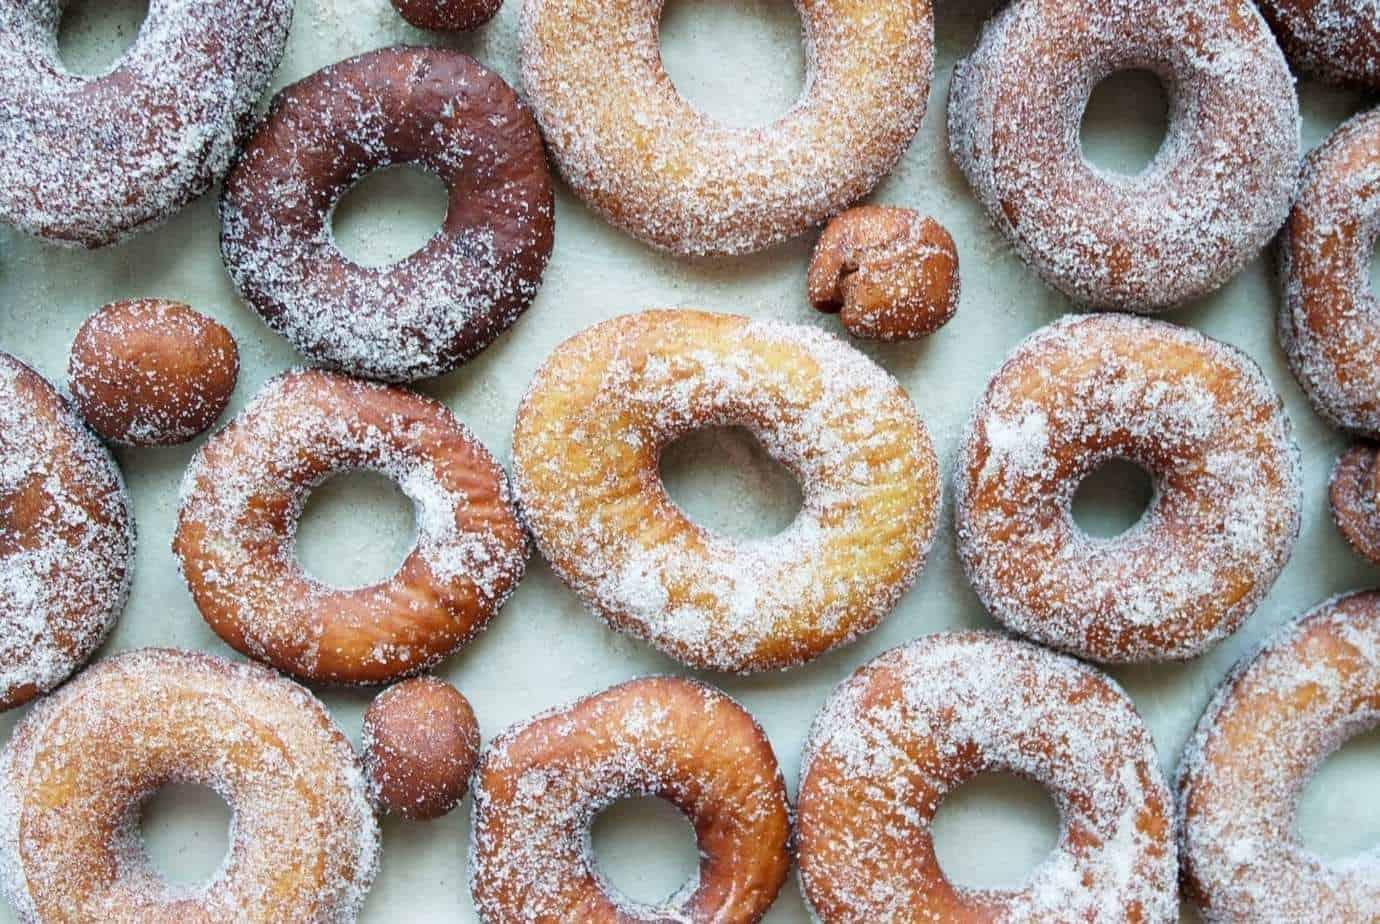 How to make Cinnamon Sugar Donuts